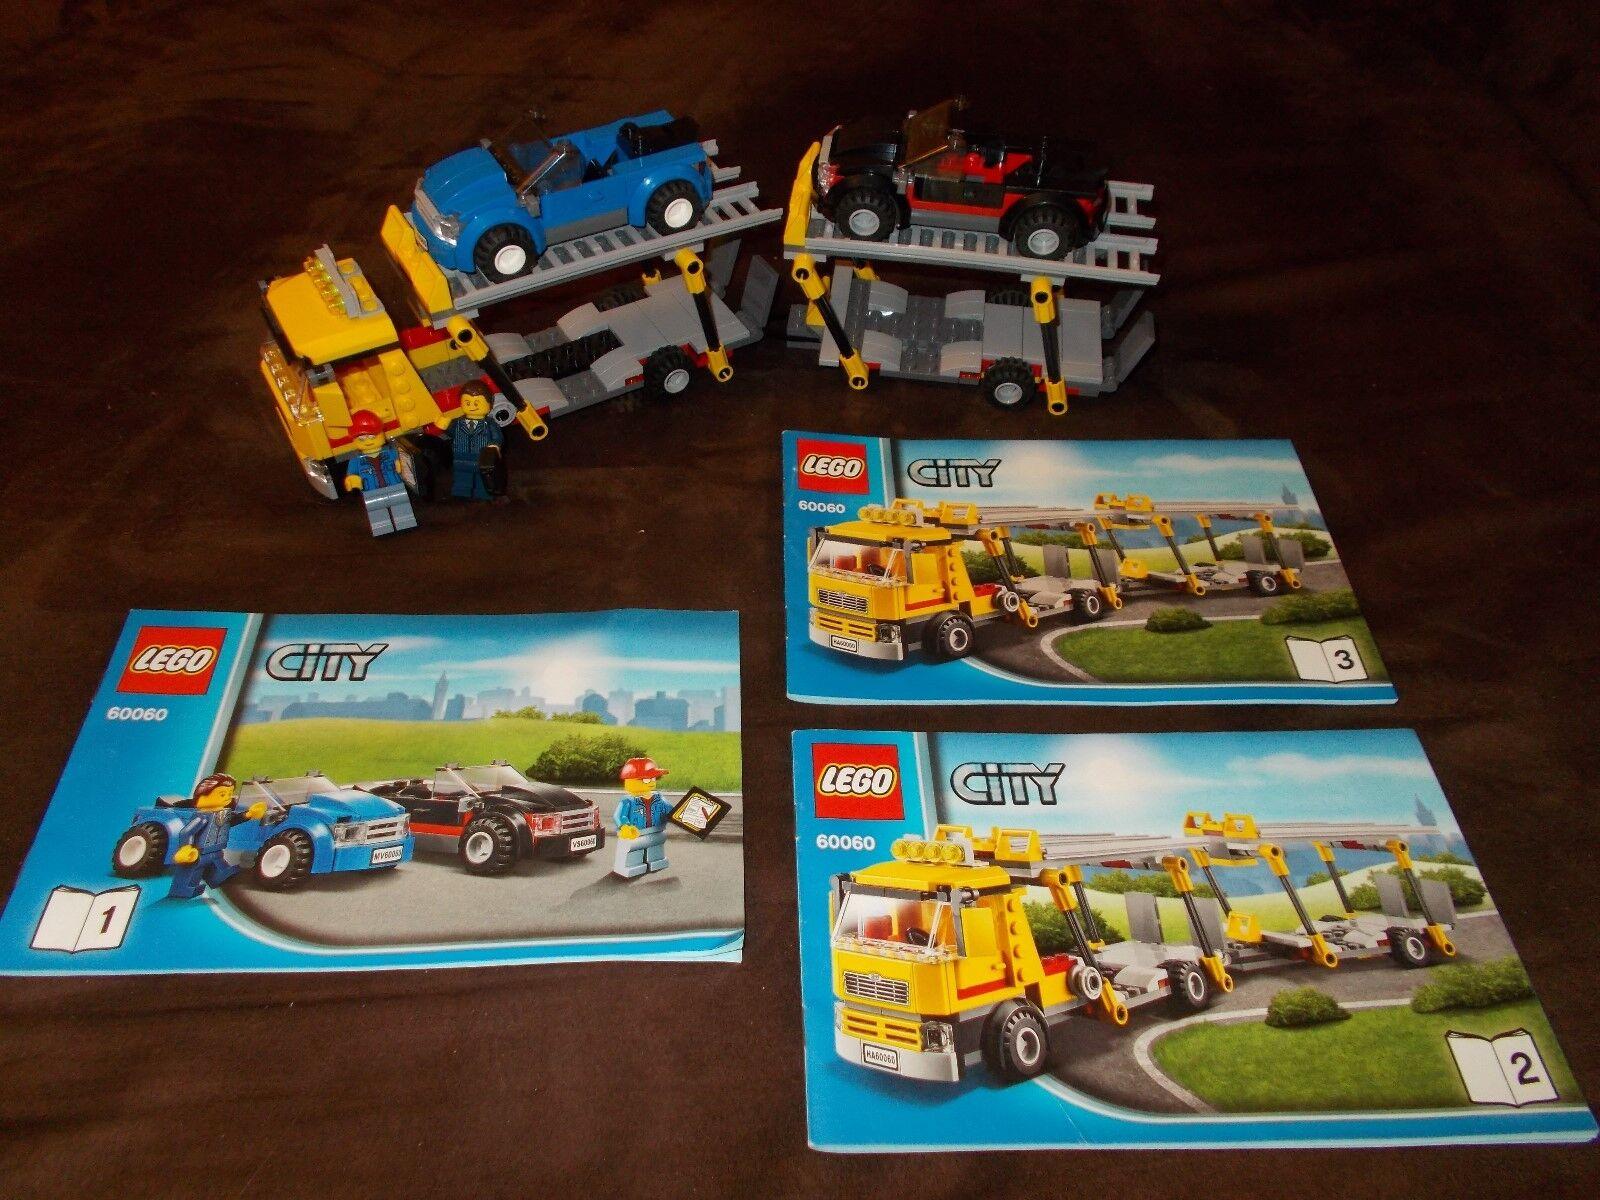 Lego® City - 60060 - Autotransporter mit Bauanleitung (BA)